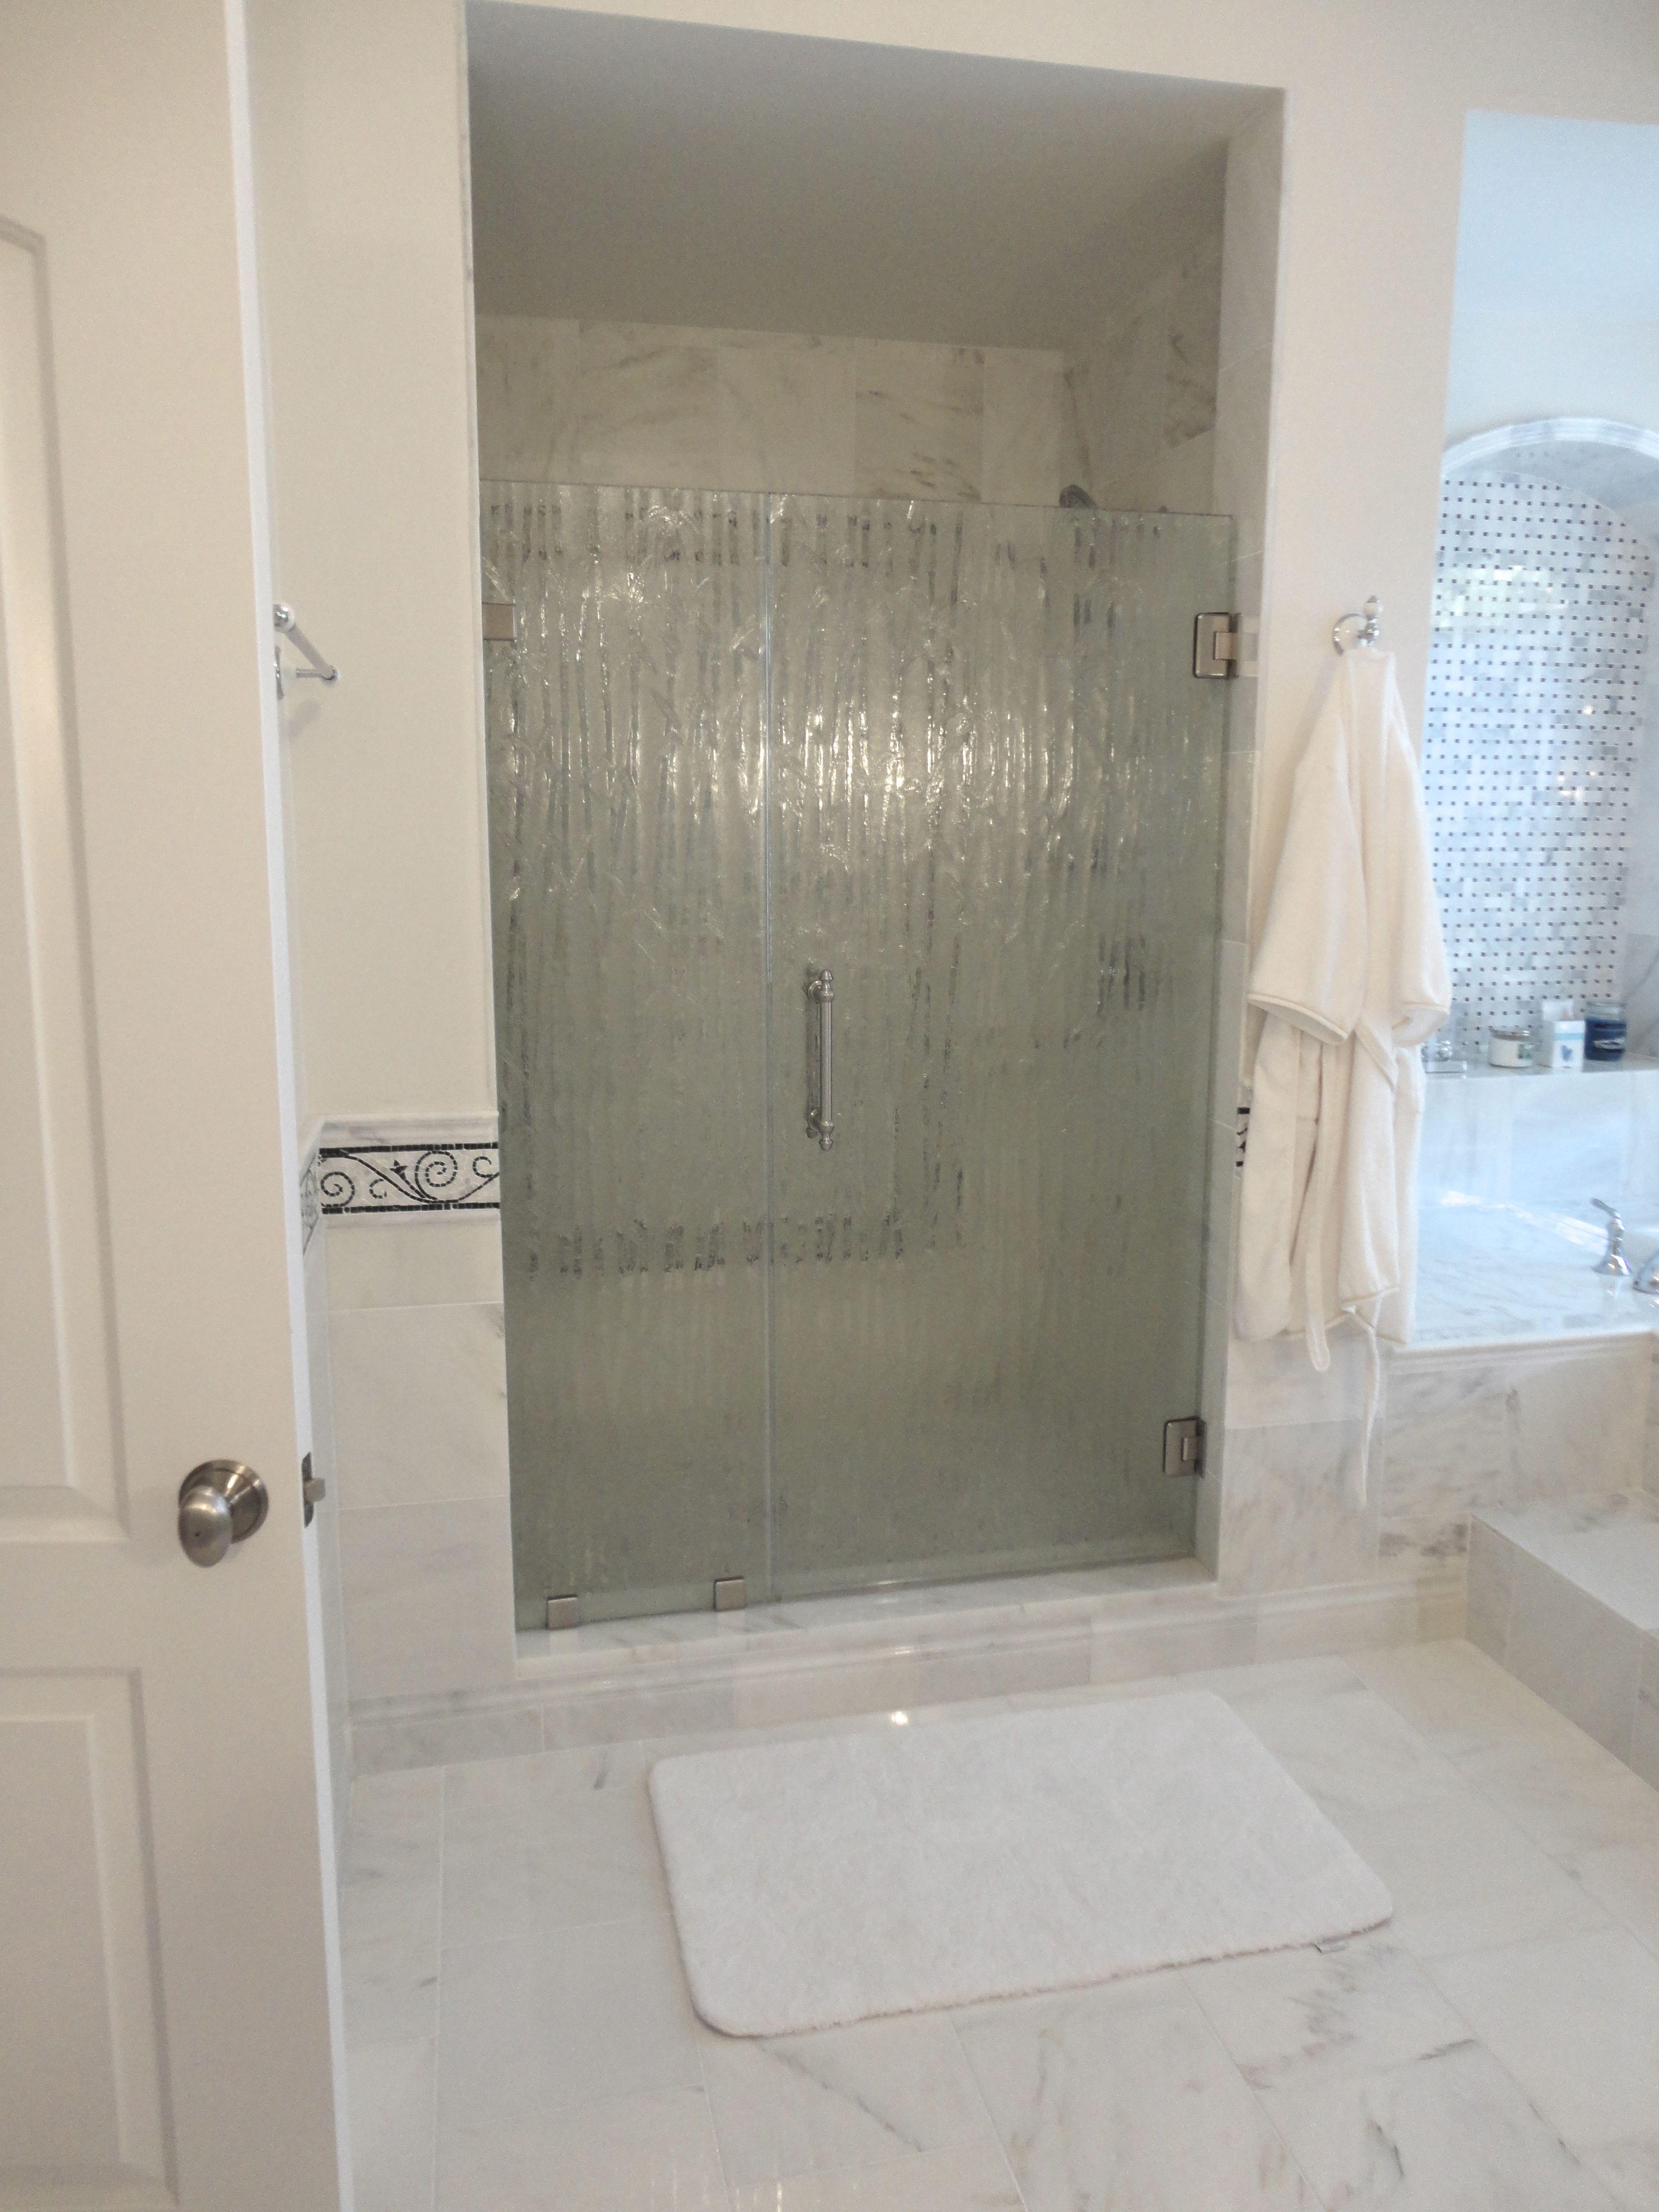 Installed Shower Doors Visit Showroom Partners Online For Hundreds Of Home Improvement Ideas Frameless Shower Doors Shower Doors Building A Small Cabin